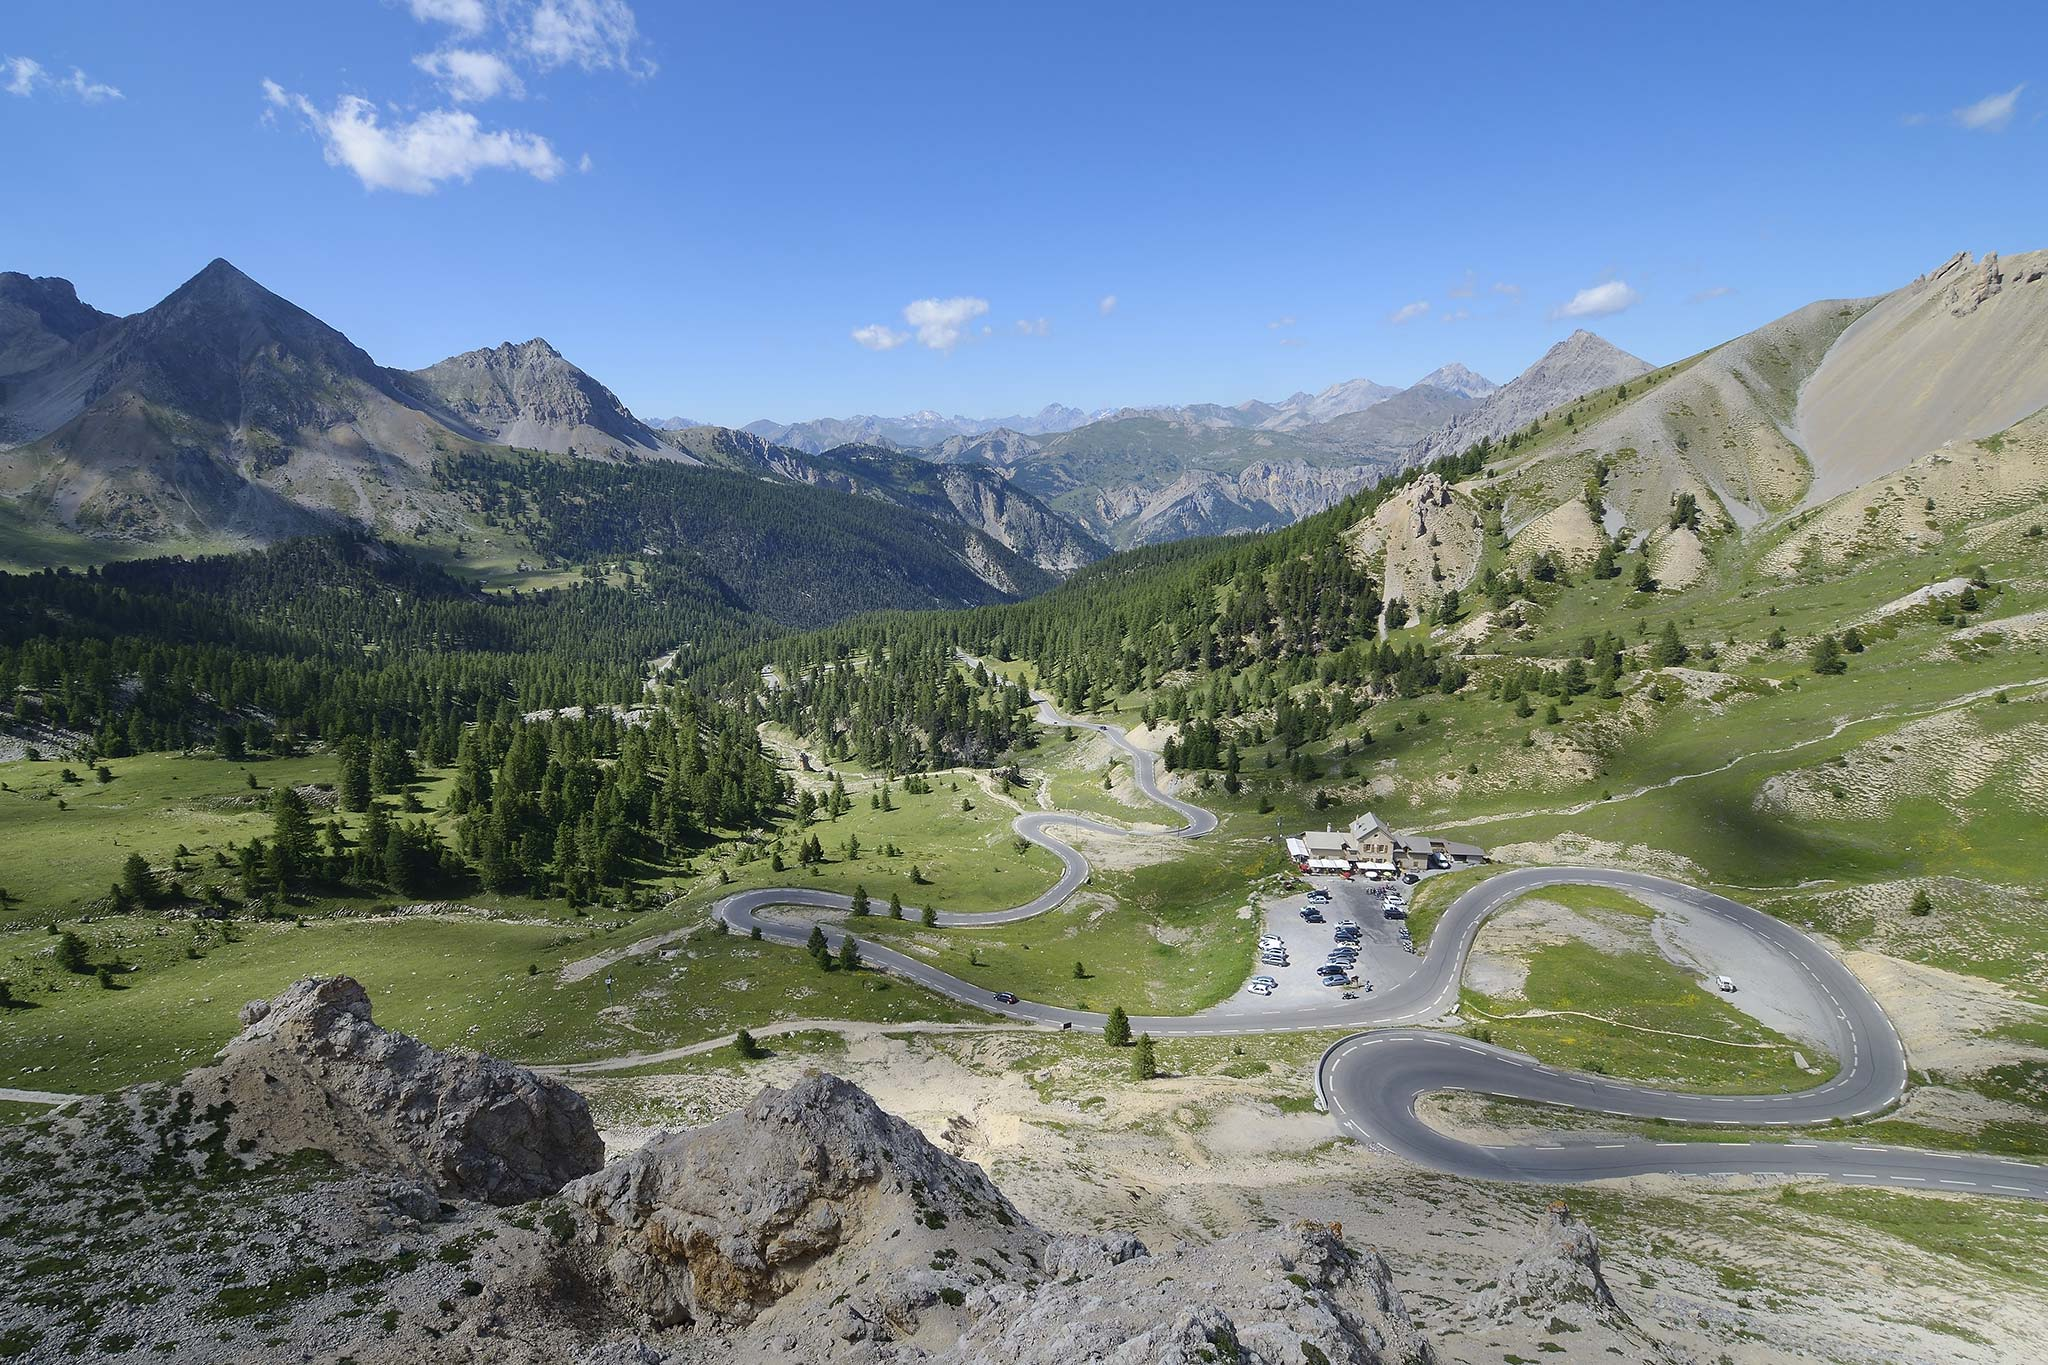 Col d'Izoard © Shutterstock